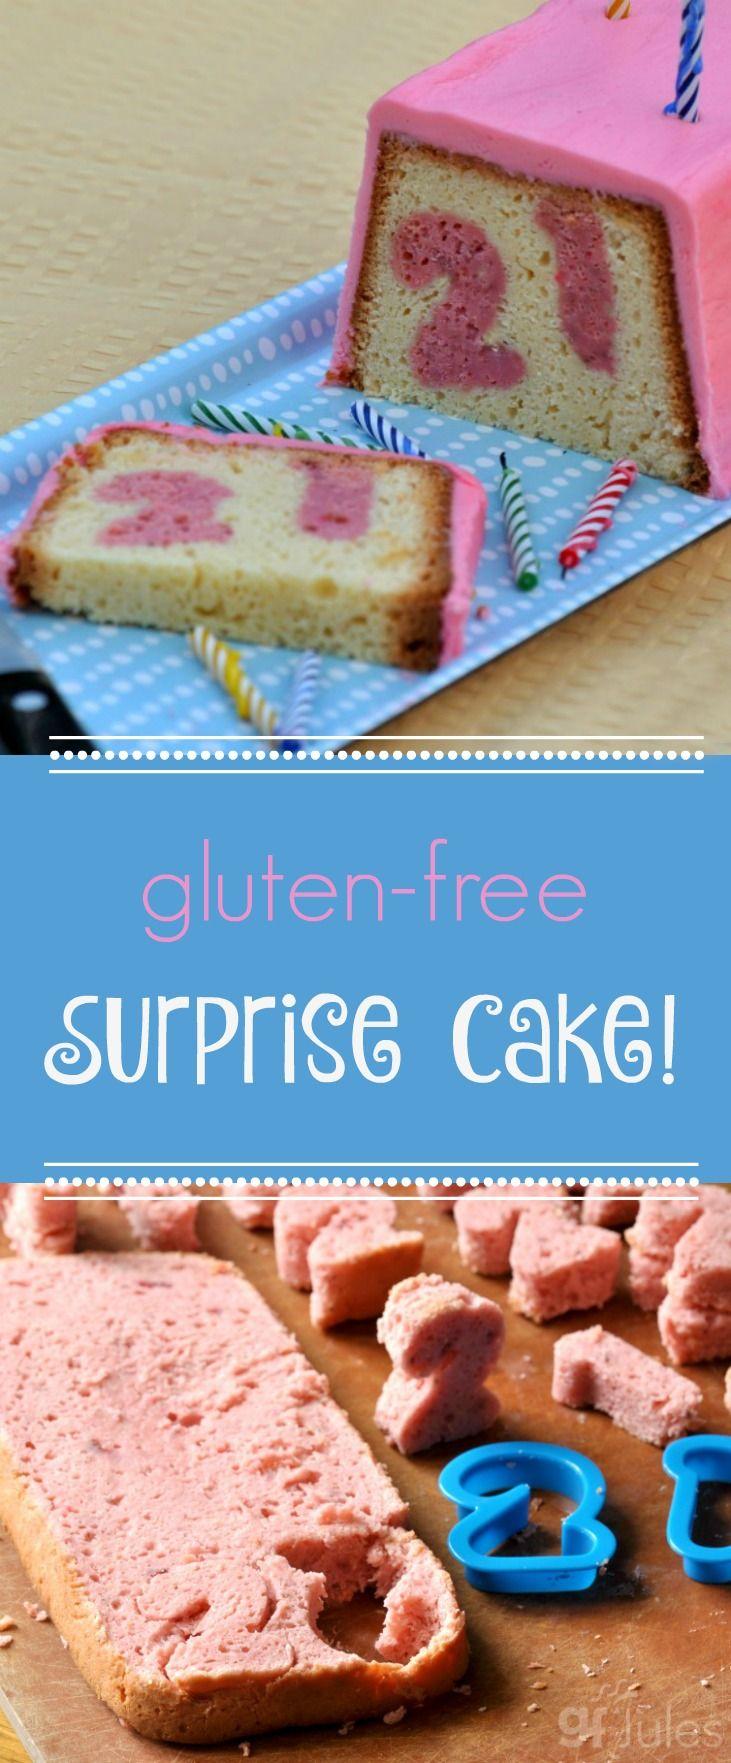 Gluten free surprise cake moist airy like a cake should